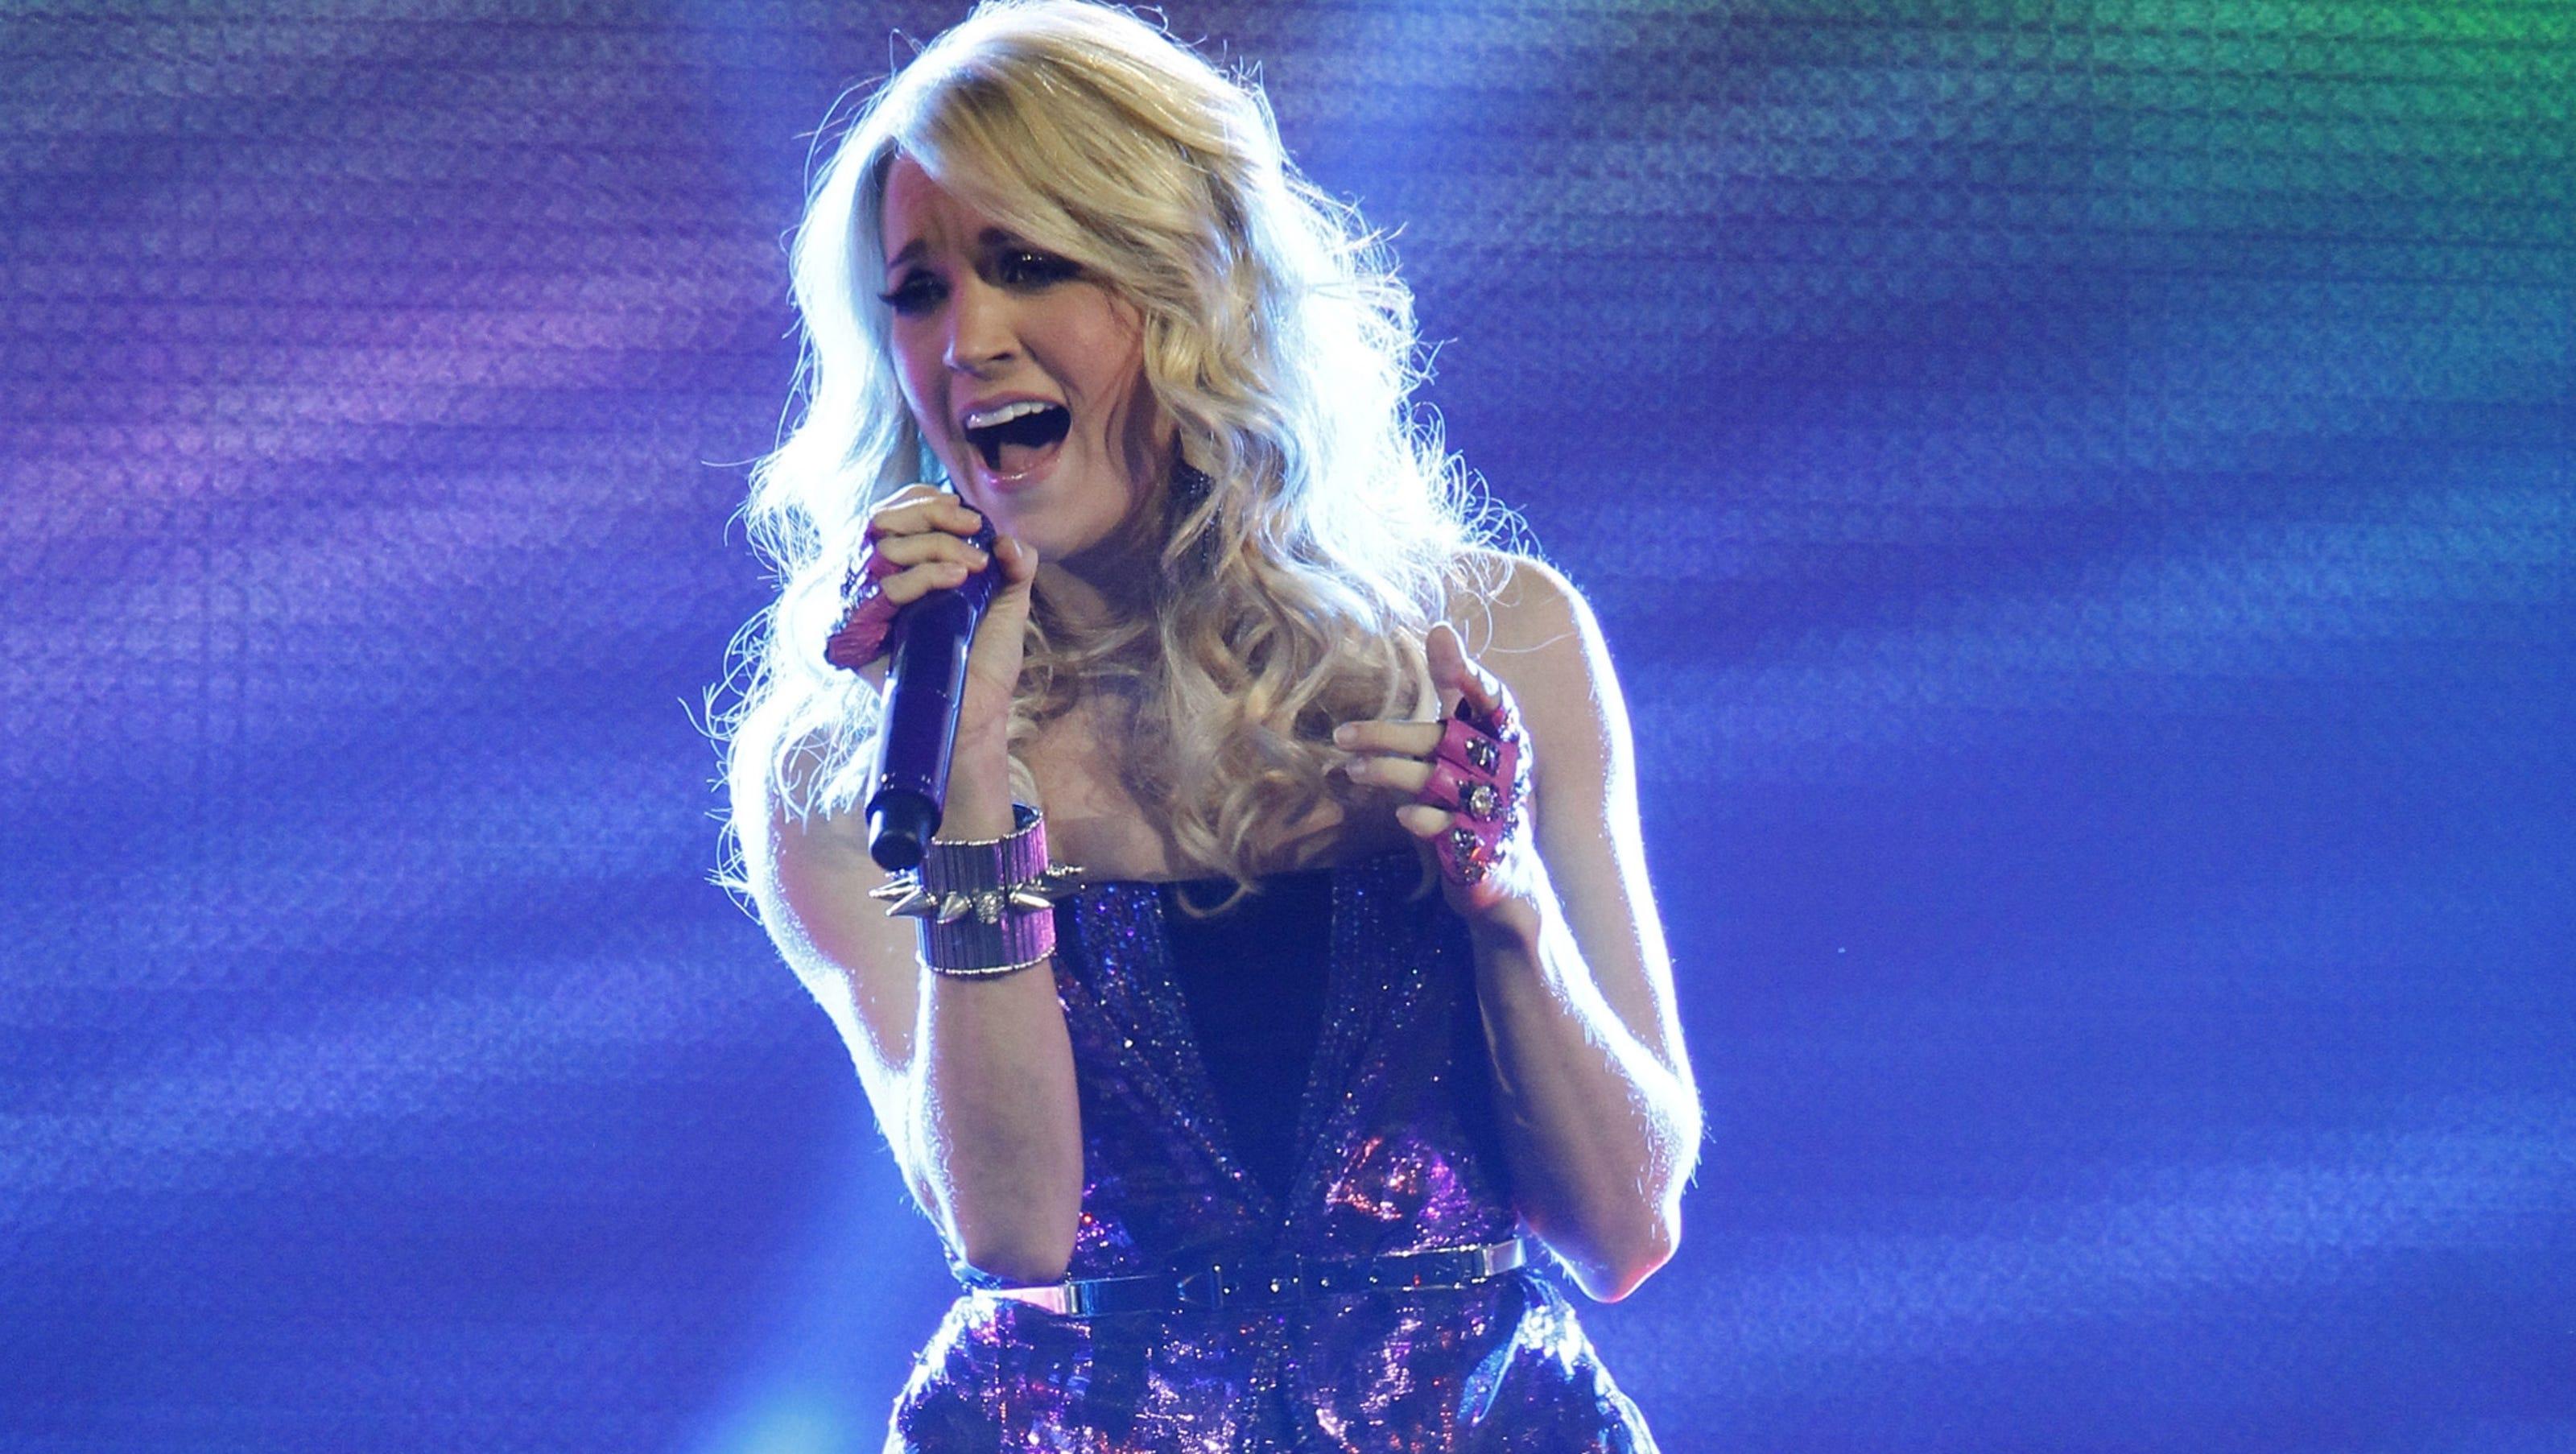 Carrie Underwood Gets Sunday Night Football Theme